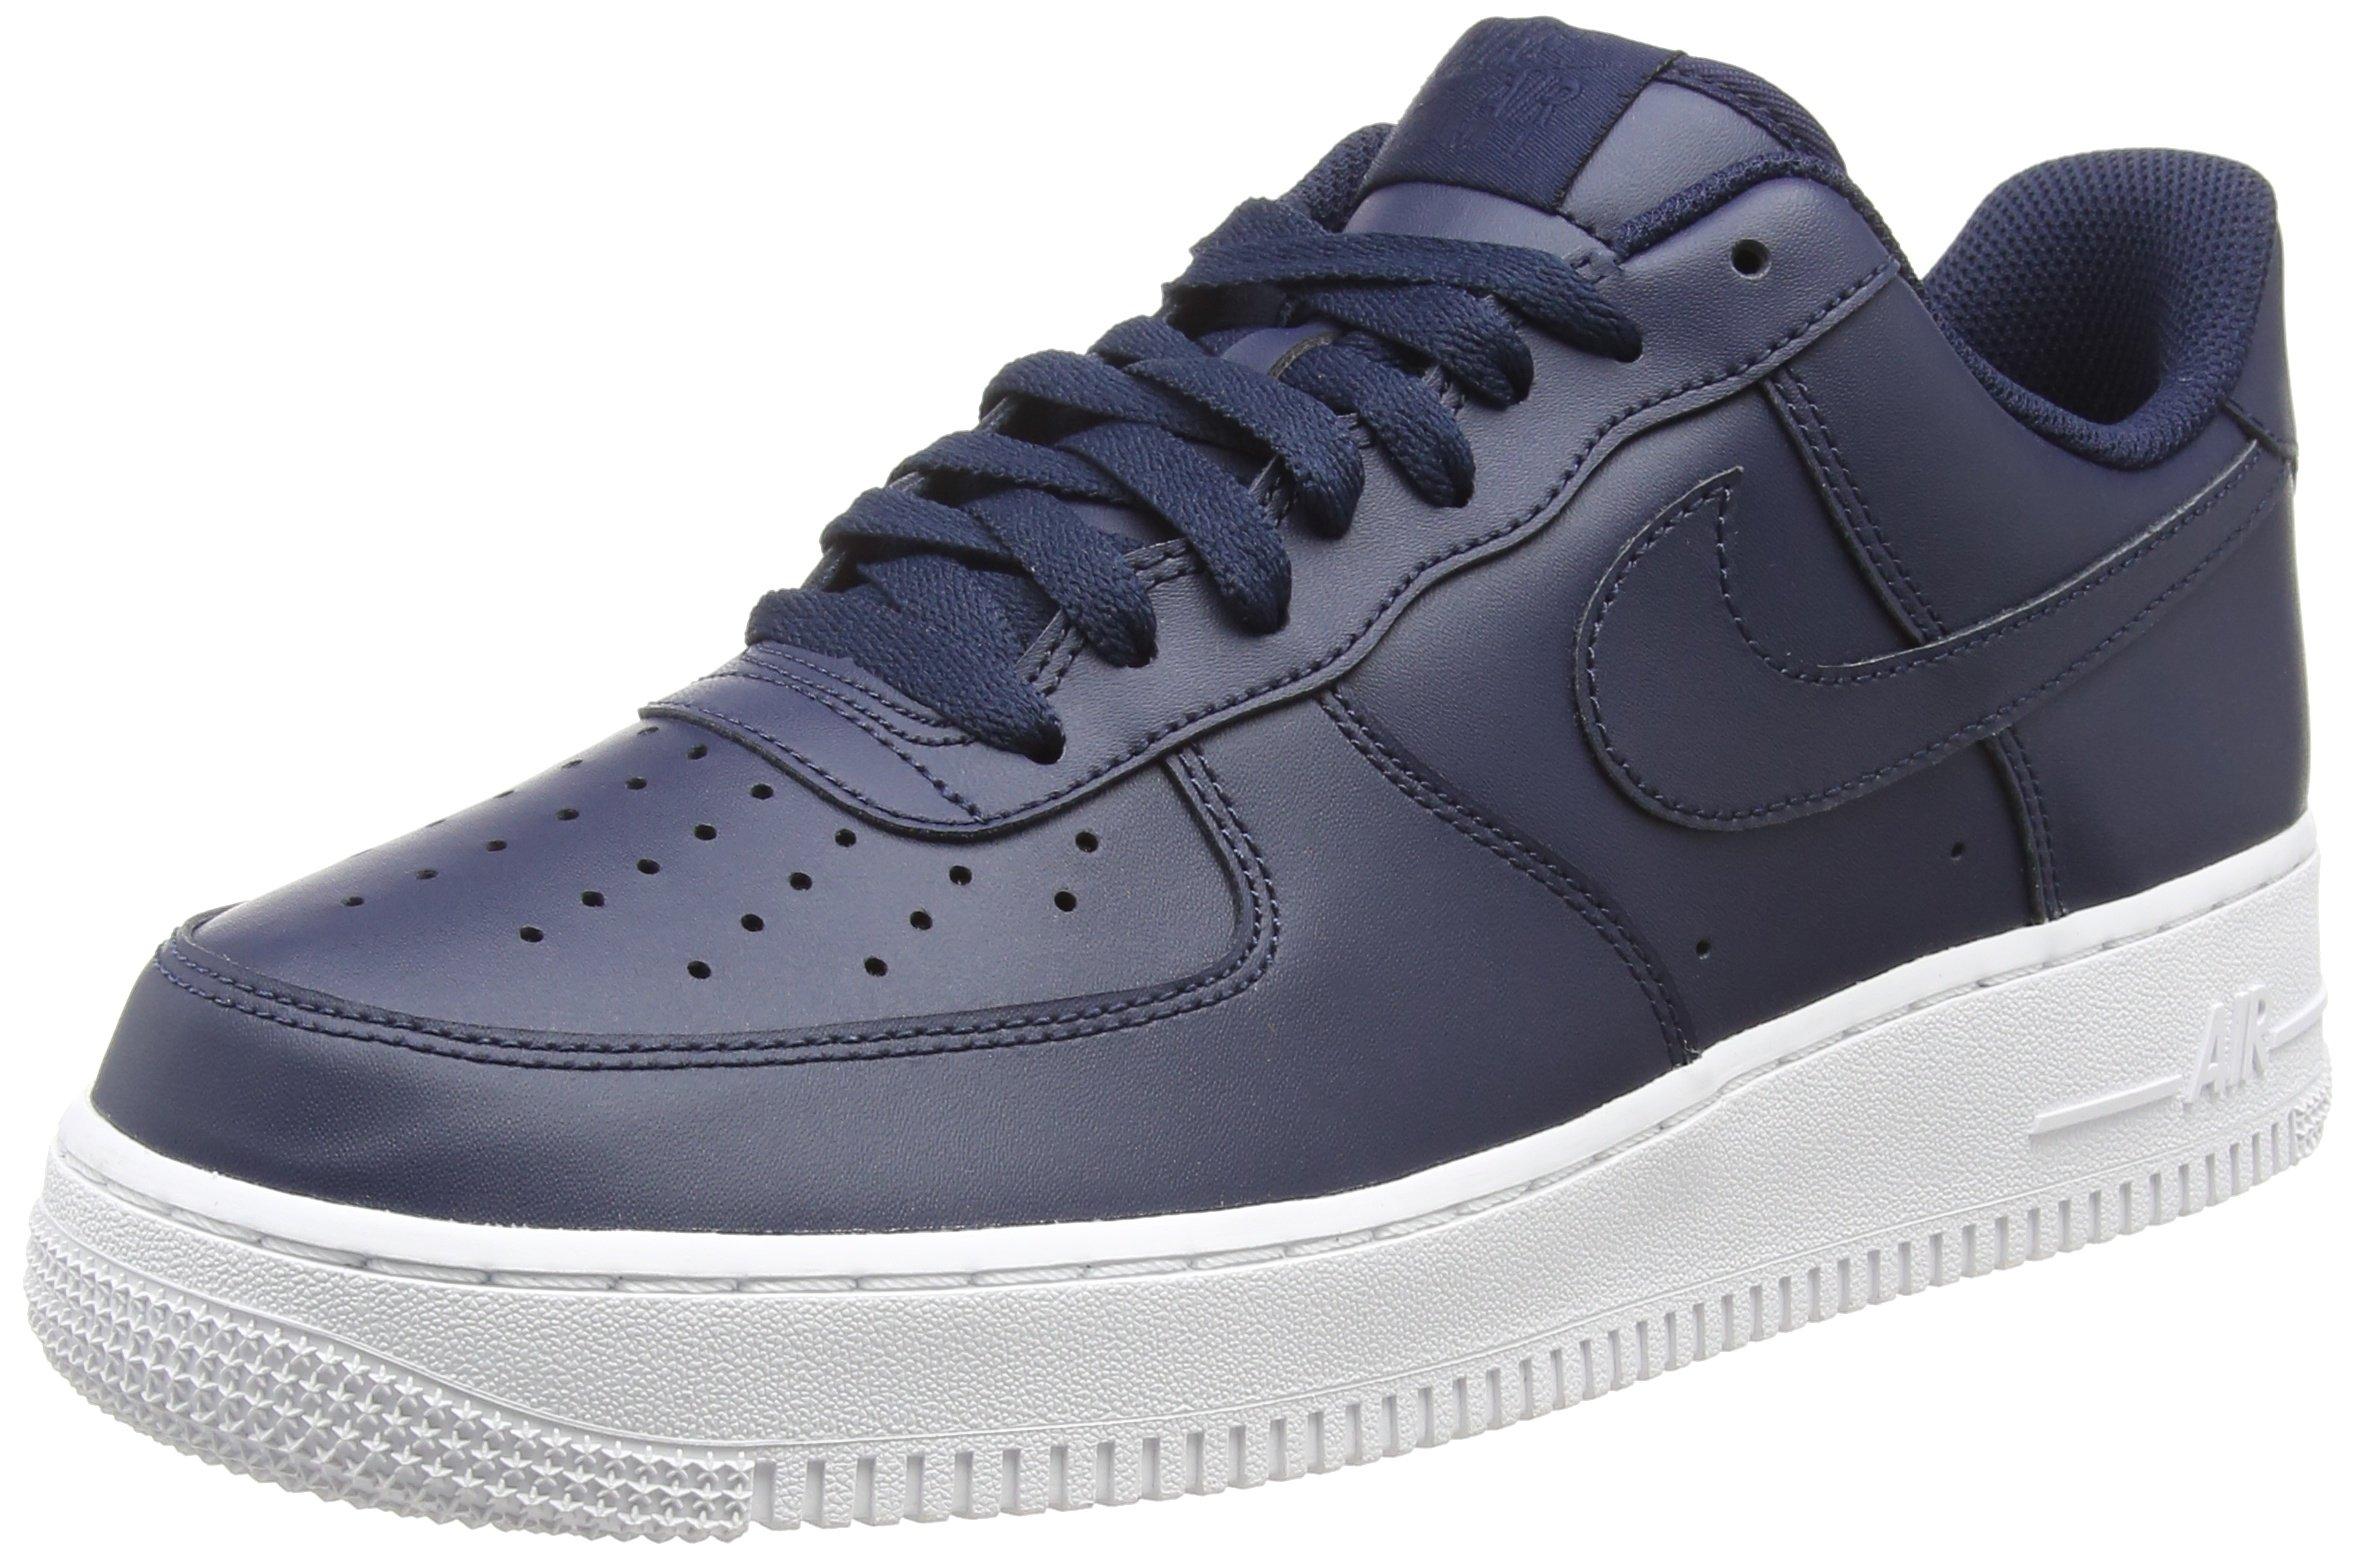 release date 89791 73f05 Galleon - NIKE Air Force 1  07, Men s Low-Top Sneakers, Blue  (Obsidian Obsidian-White 400), 10 UK (45 EU)